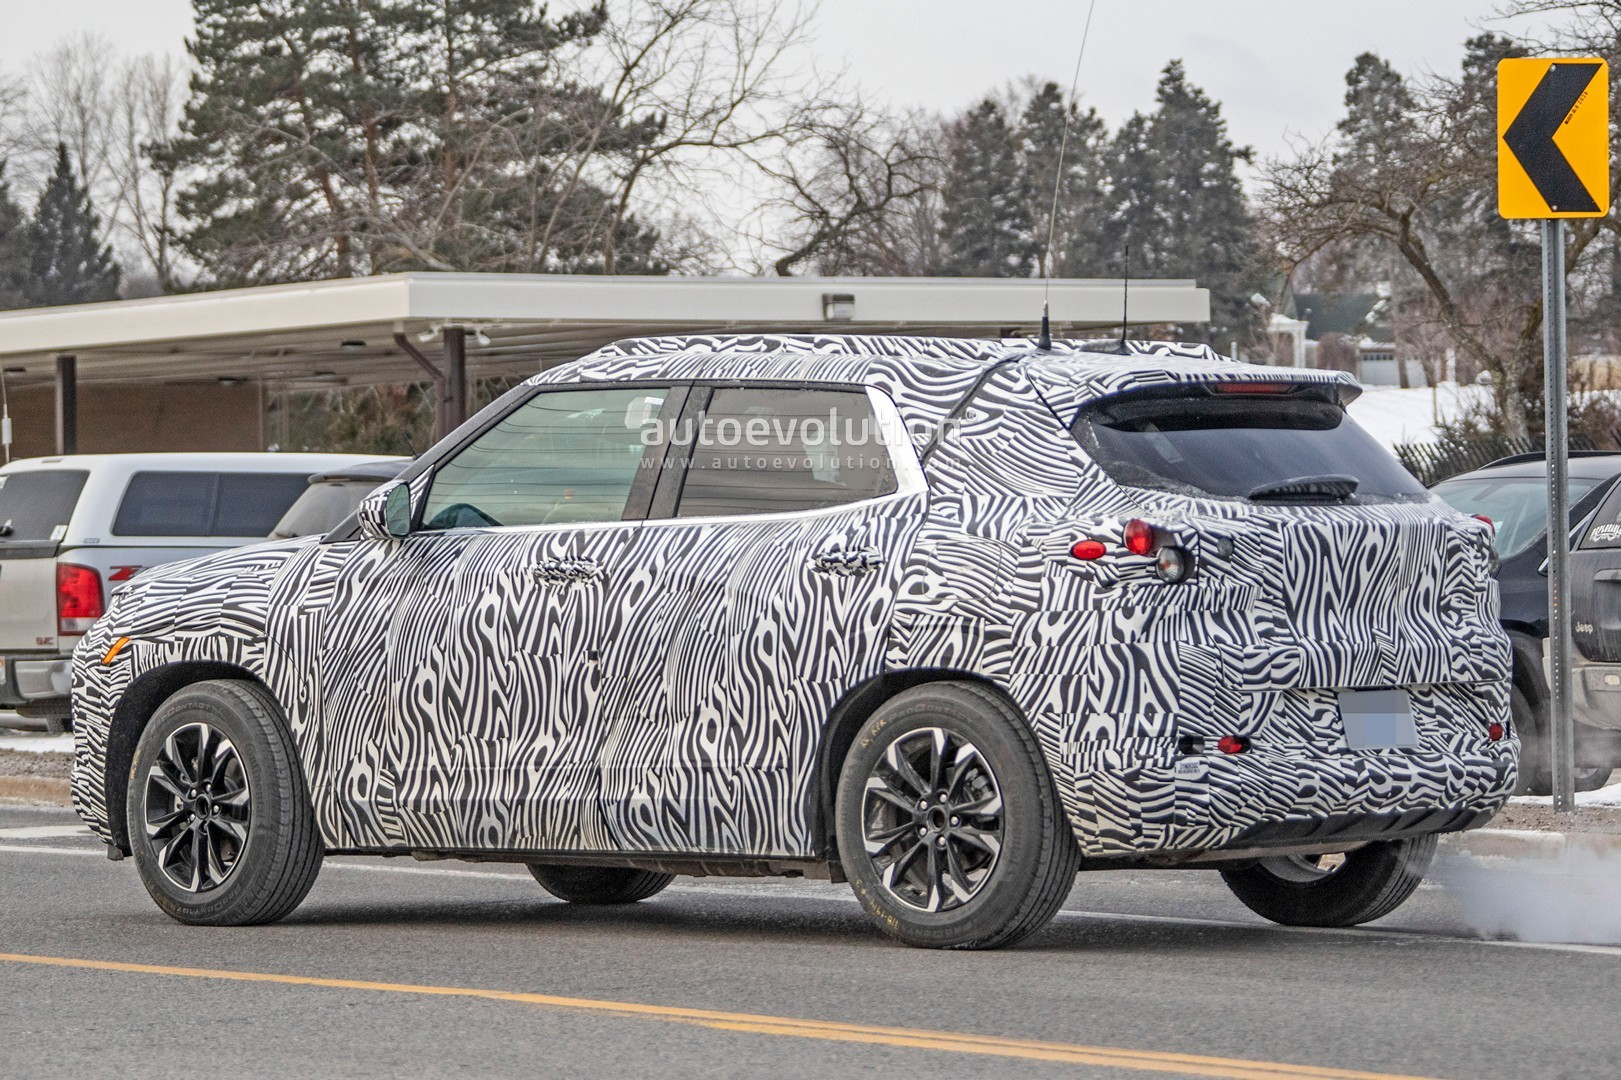 New Blazer SUV Inspires 2020 Chevy Trax >> New Blazer Suv Inspires 2020 Chevy Trax Upcoming New Car Release 2020